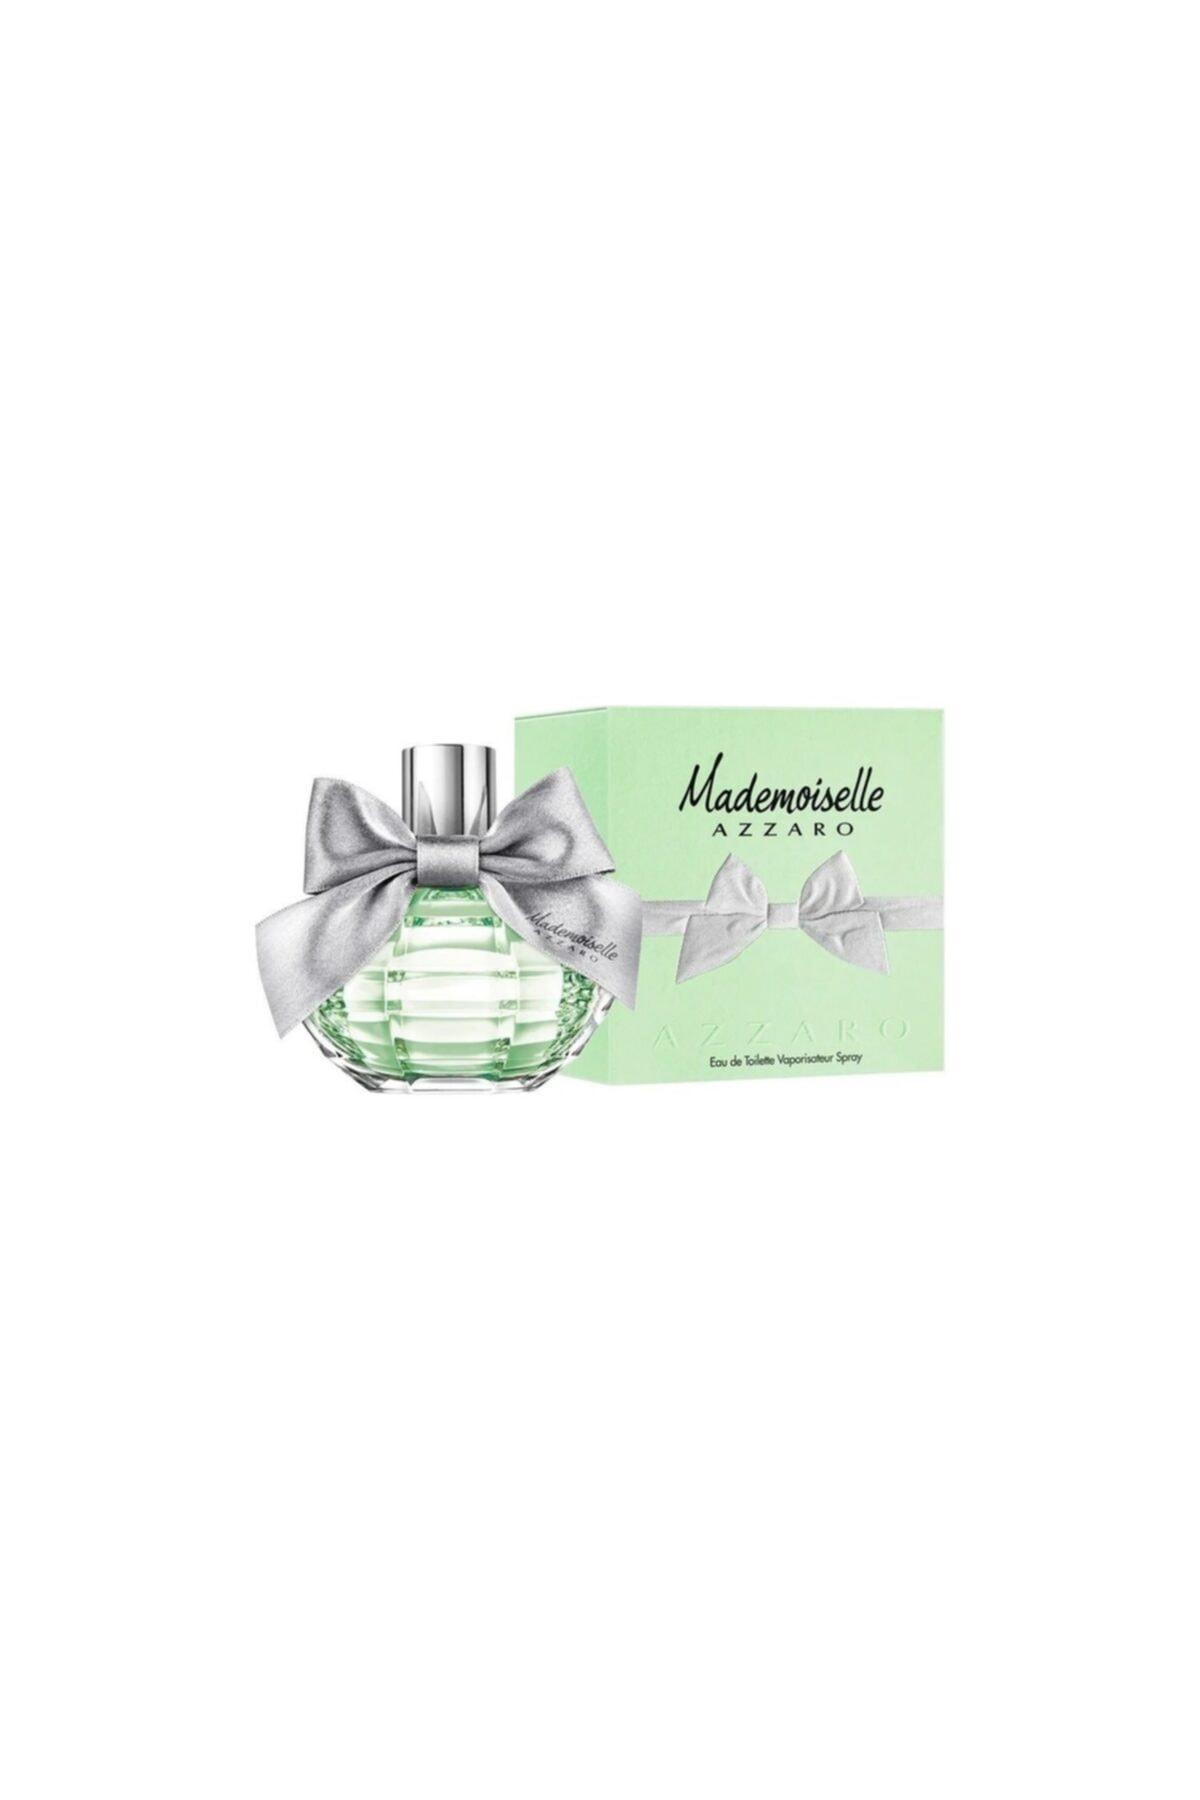 Azzaro Mademoiselle L'eau Edt 50 ml Kadın Parfüm 3351500009190 2